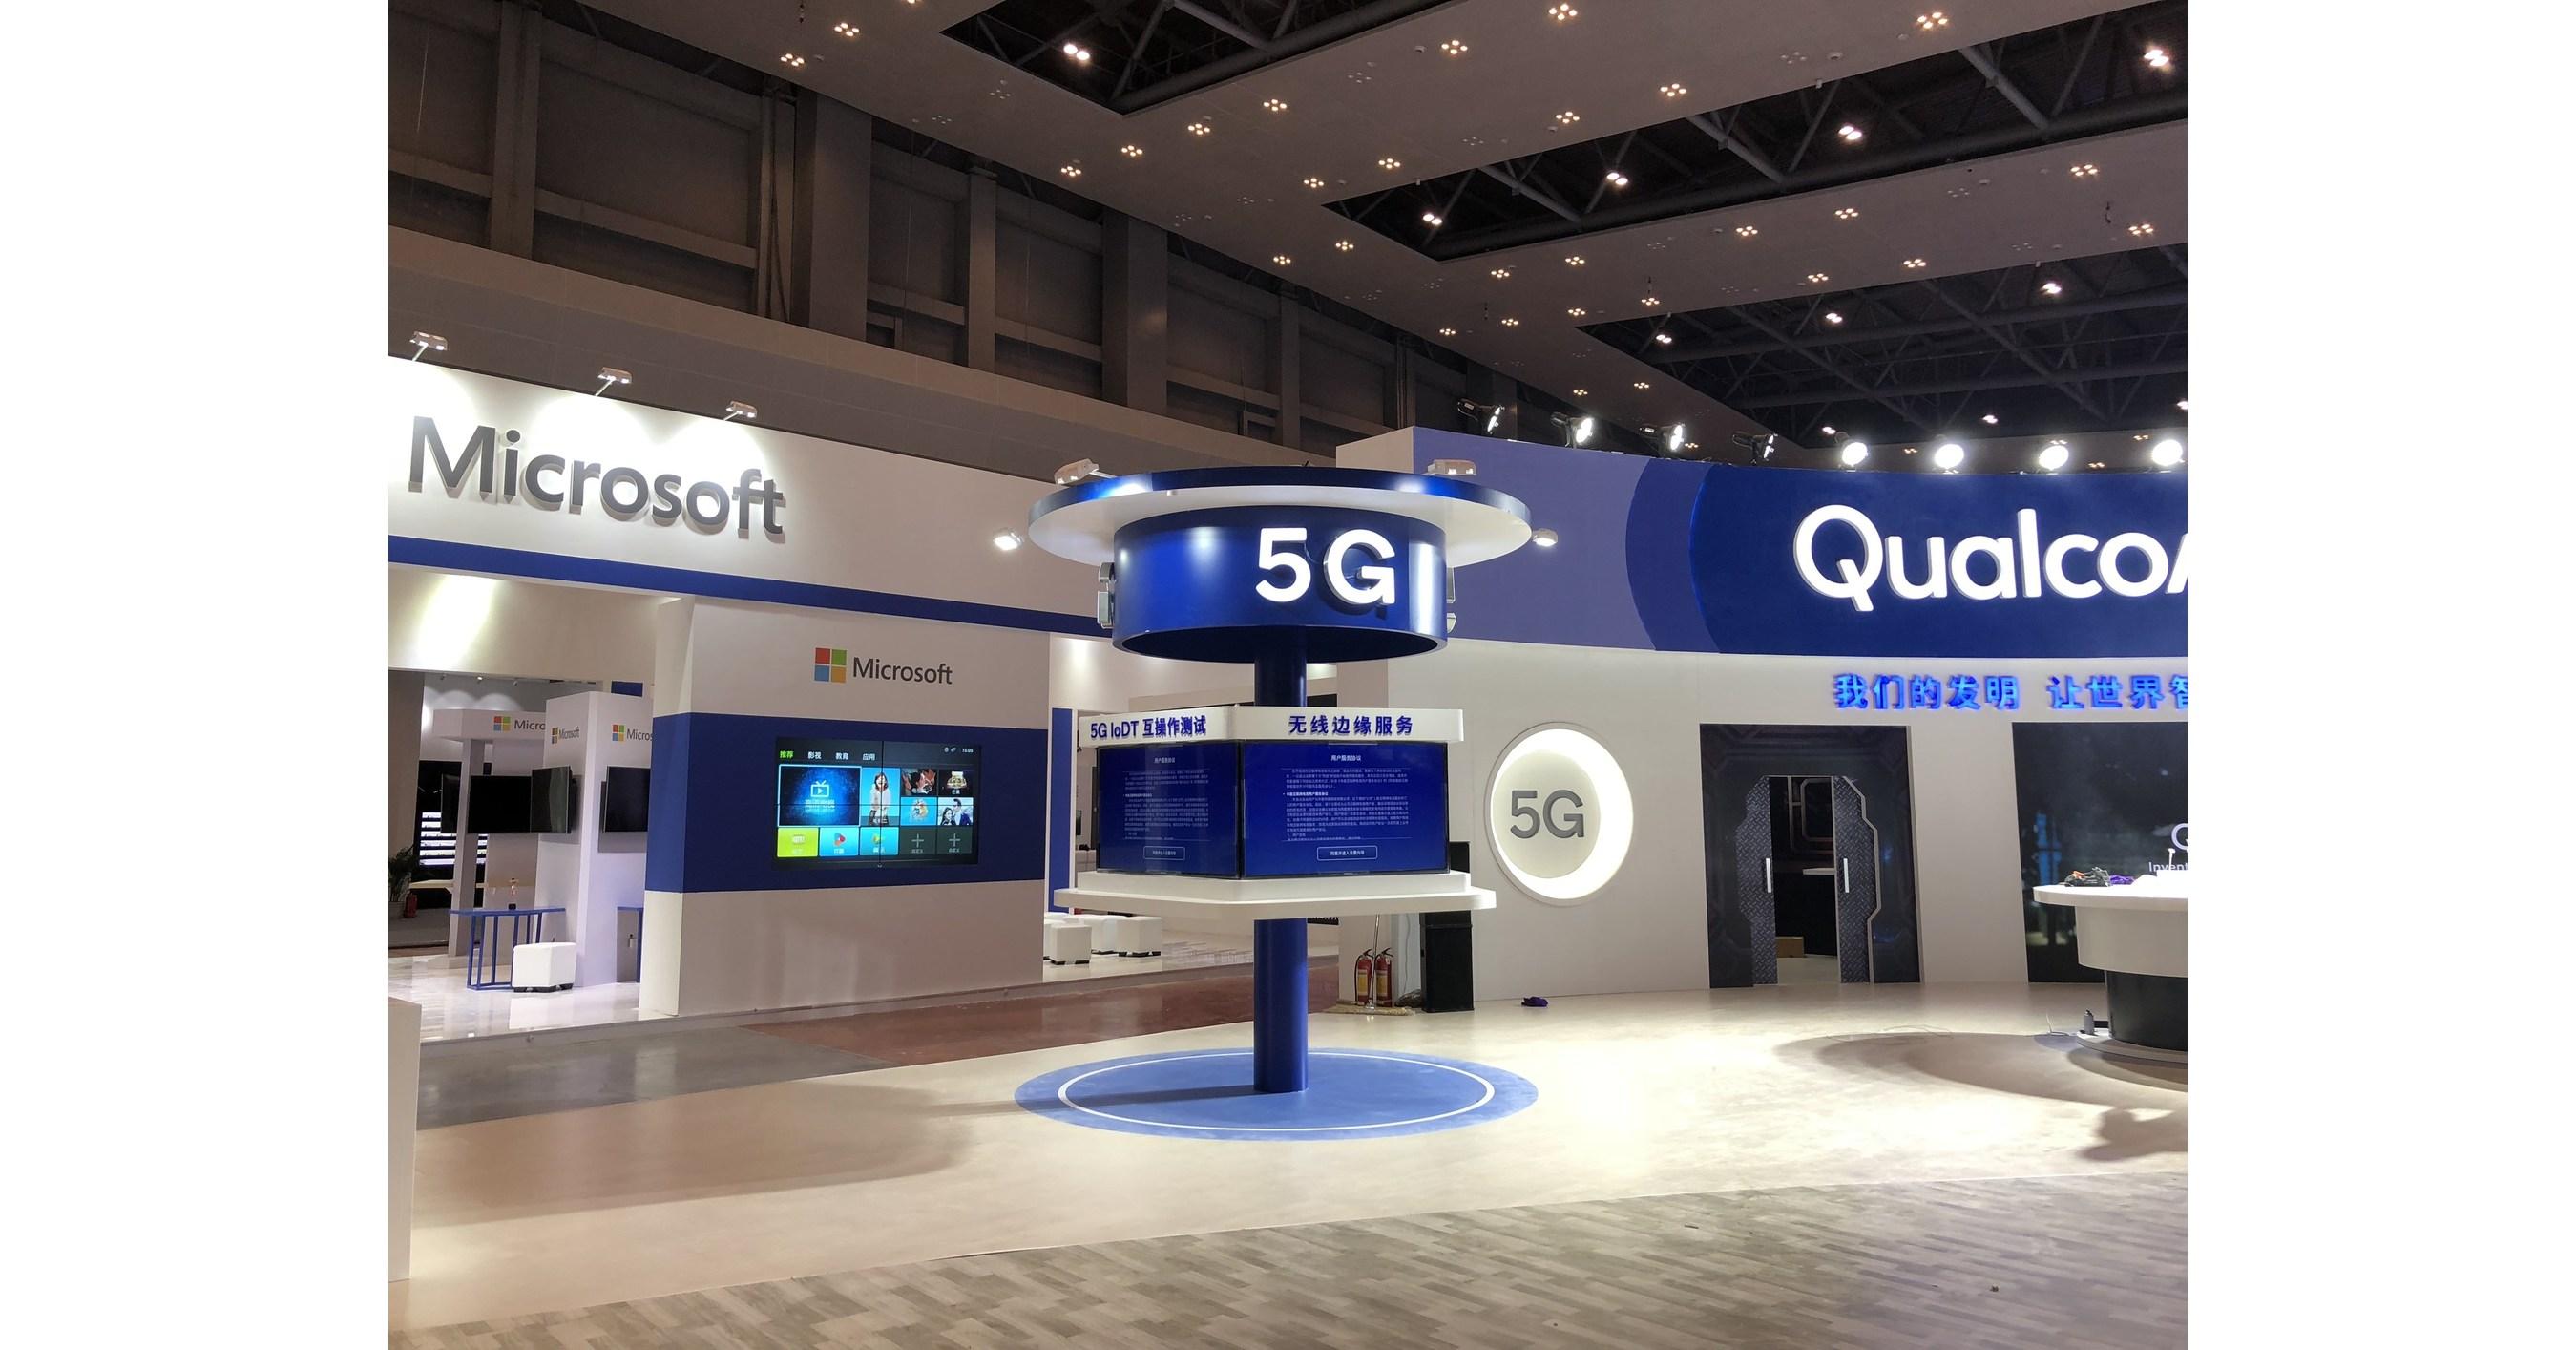 Chongqing to Host Smart China Expo, Boosting Development of Big Data Technology